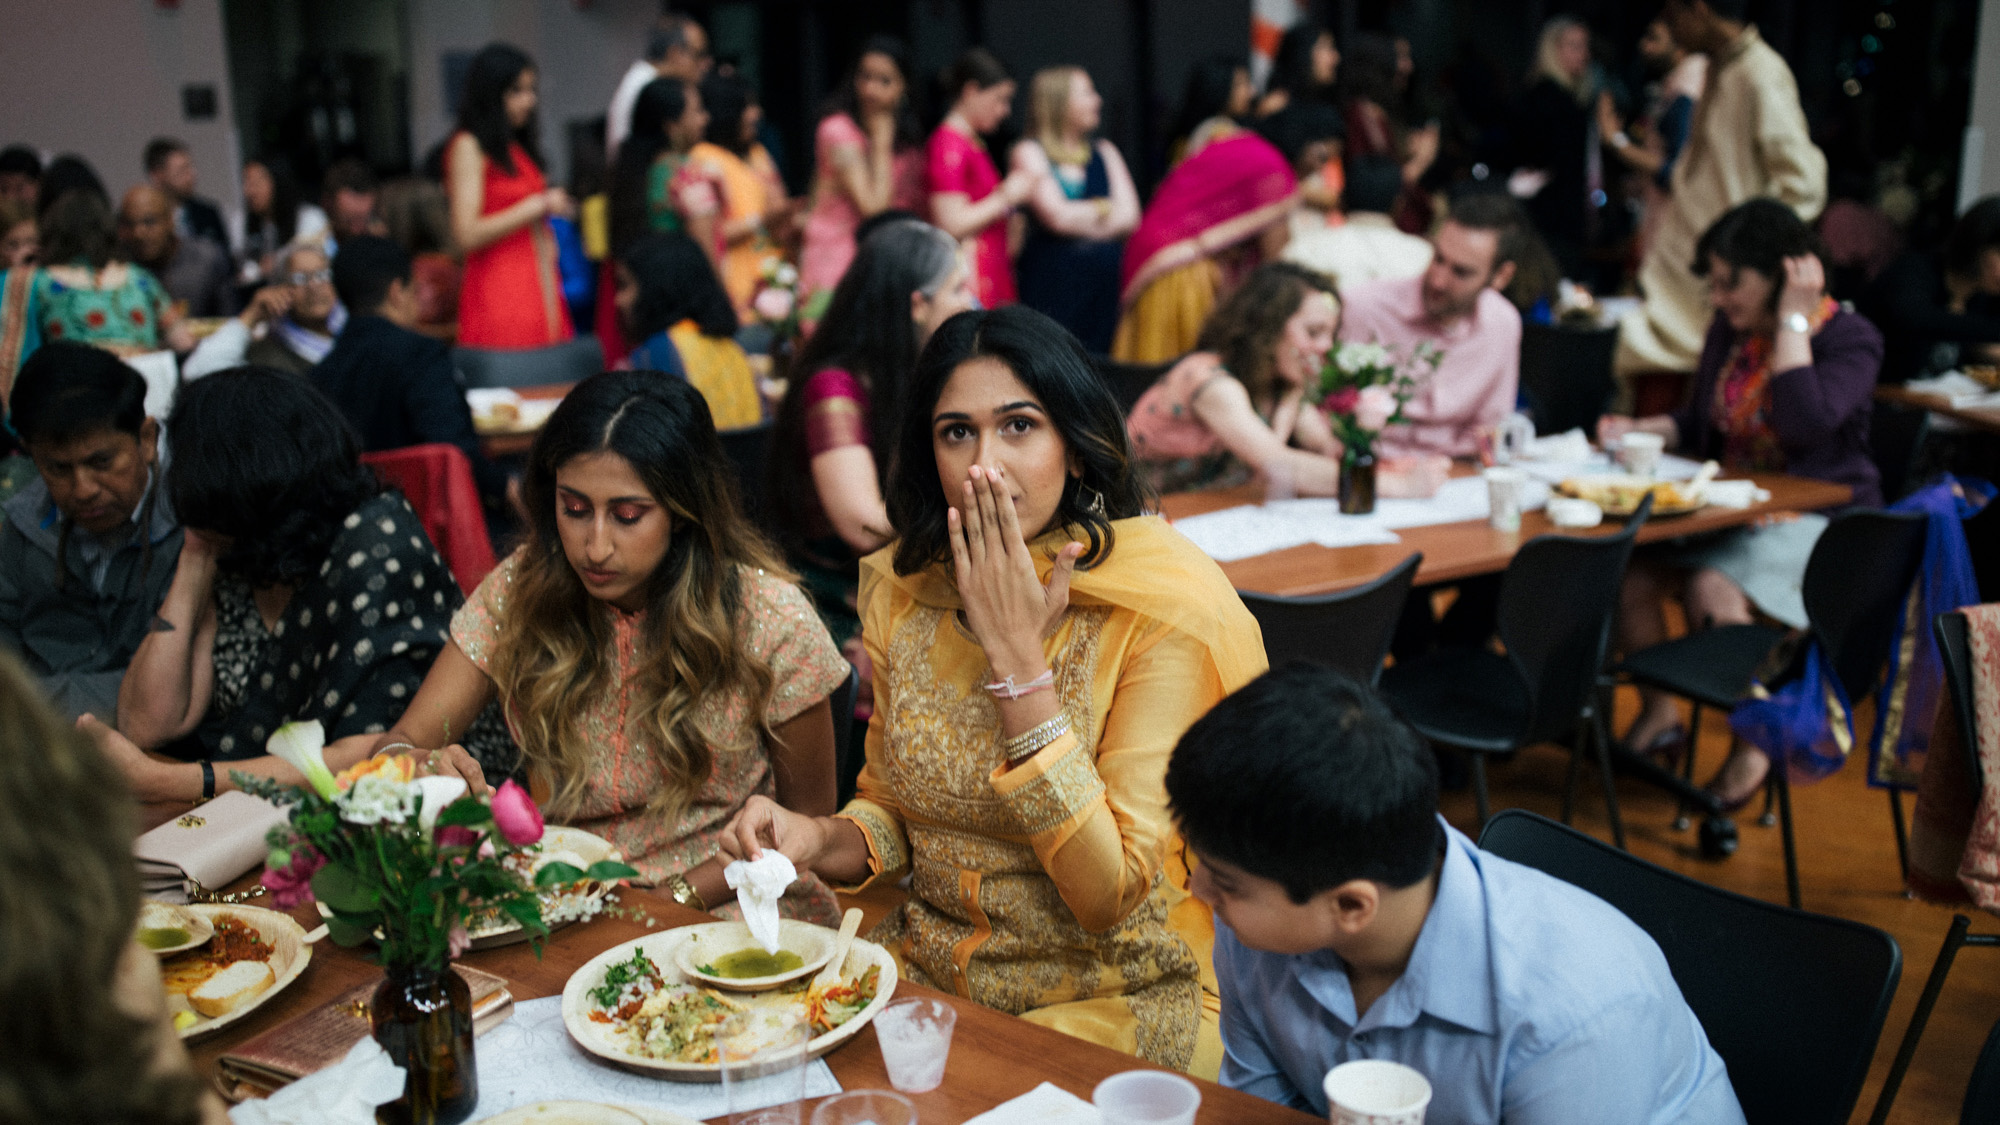 anu_maneesh_alec_vanderboom_Indian_wedding_photography-0031.jpg